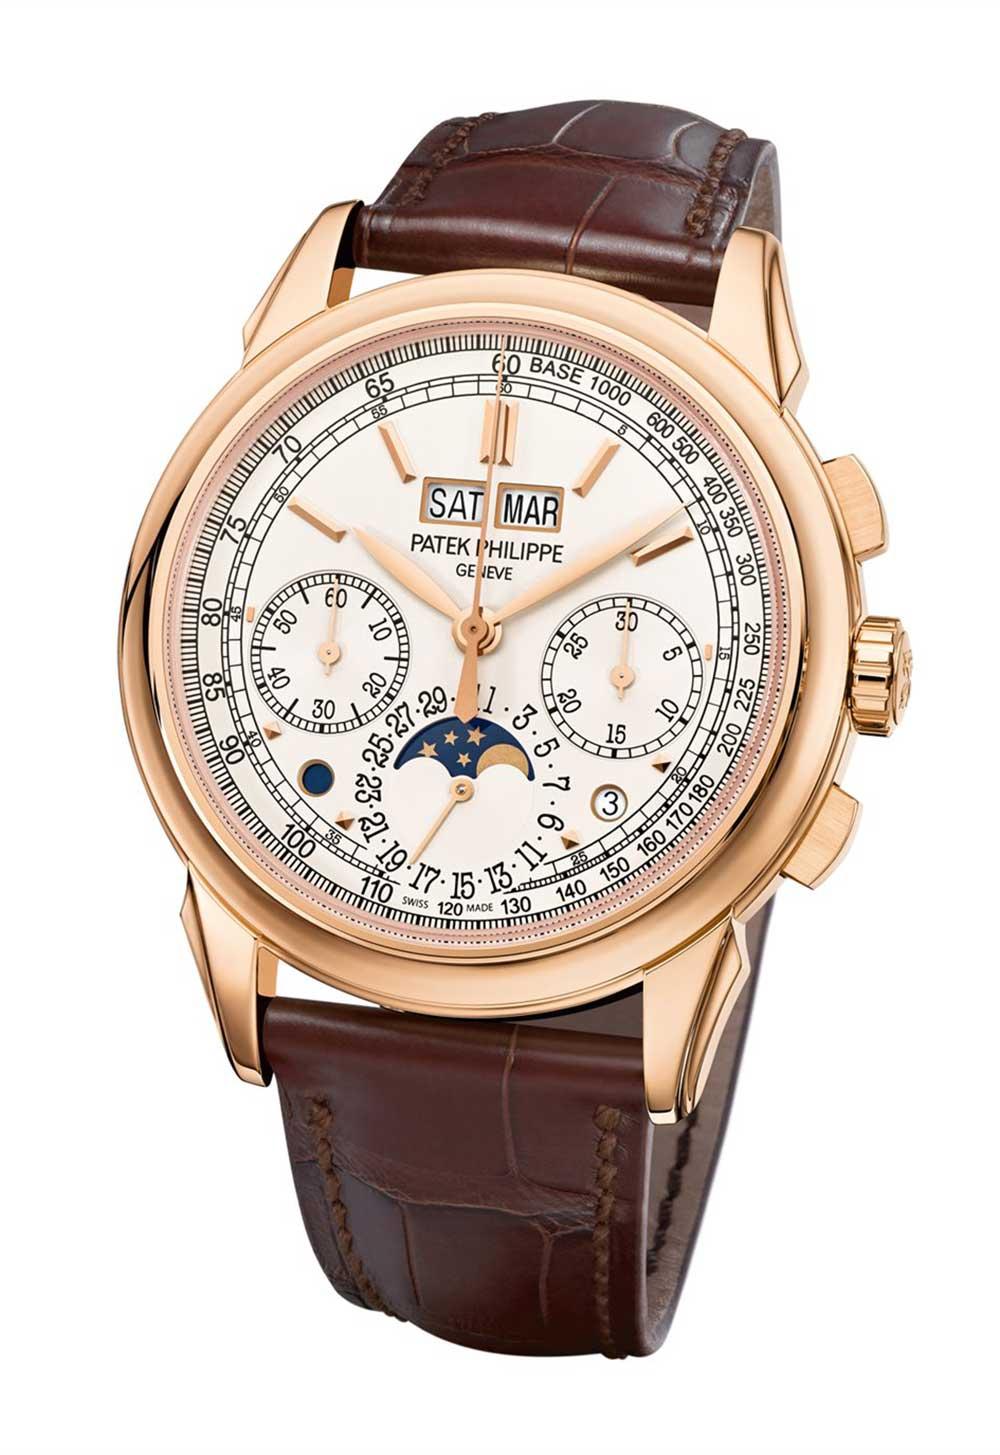 Patek Philippe 5270R Perpetual Calendar Chronograph